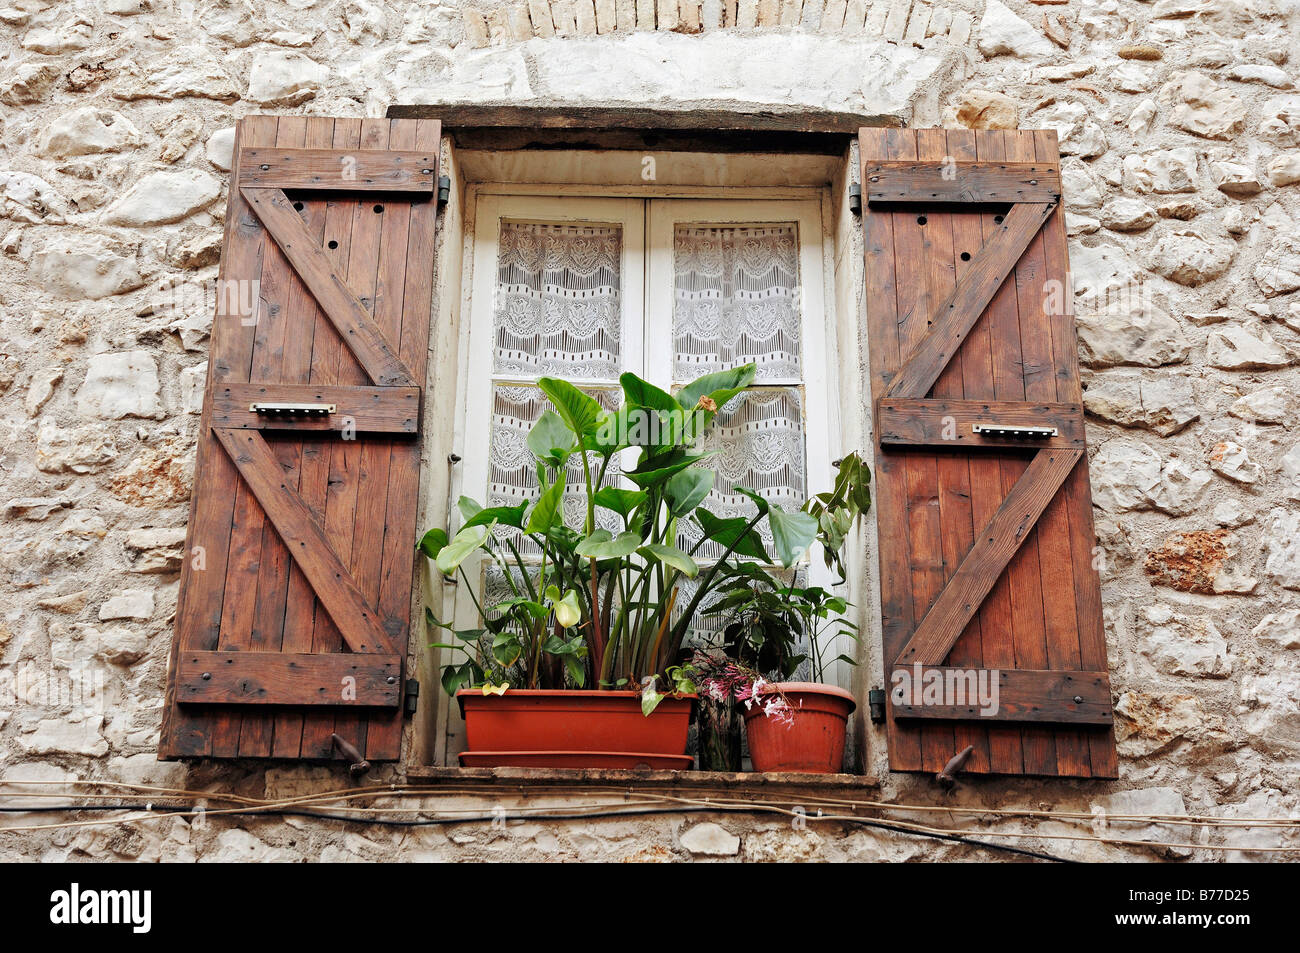 Window and shutters, La Colle sur Loup, Alpes-Maritimes, Provence-Alpes-Cote d'Azur, Southern France, France, - Stock Image